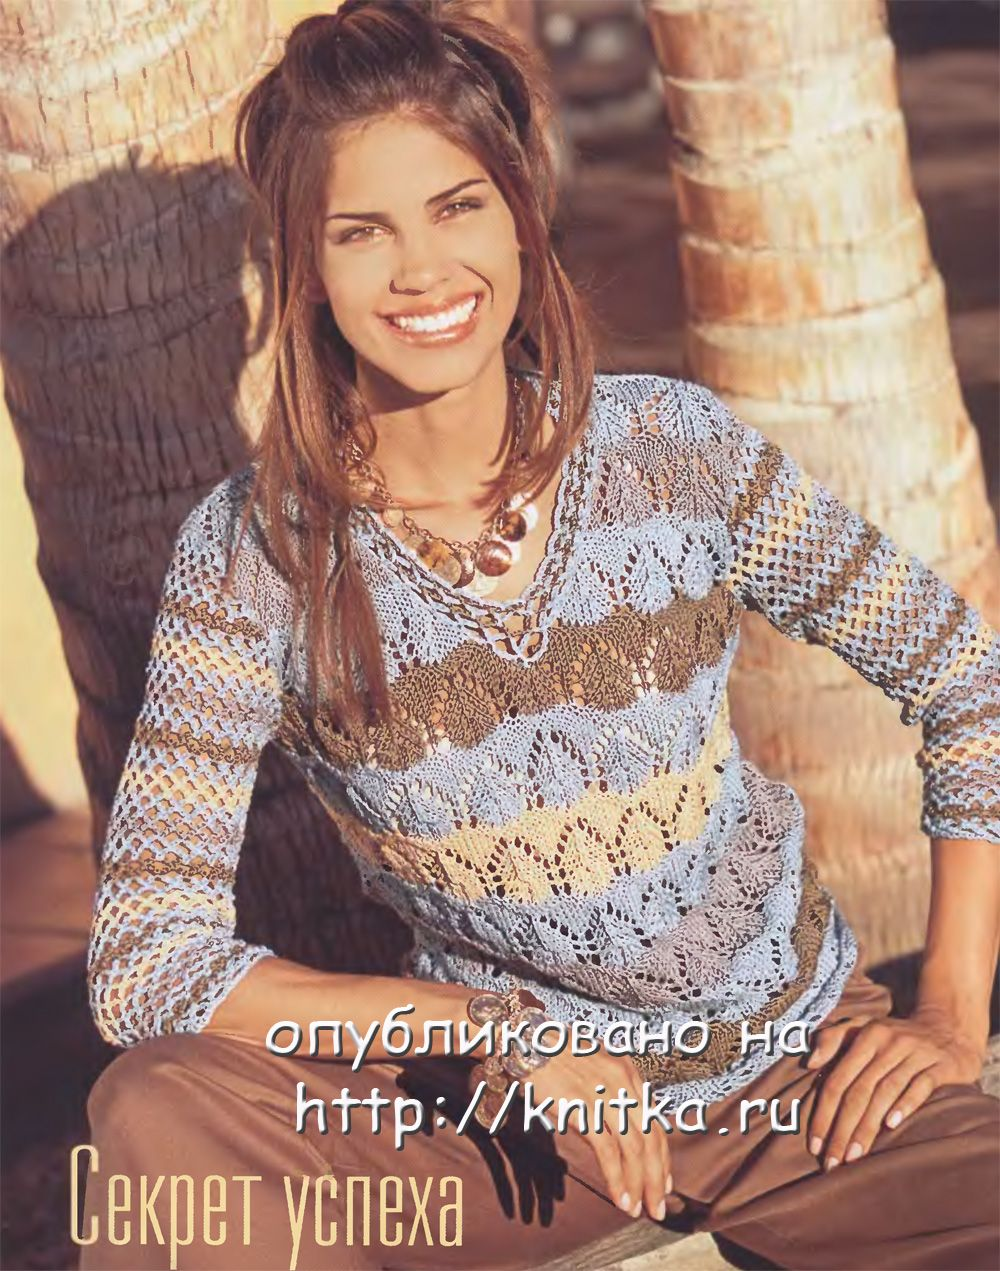 Lt b gt вязаный спицами свитер lt b gt из рубрики lt b gt вязание lt b gt для женщин lt b gt вязание lt b gt lt b gt lt b gt